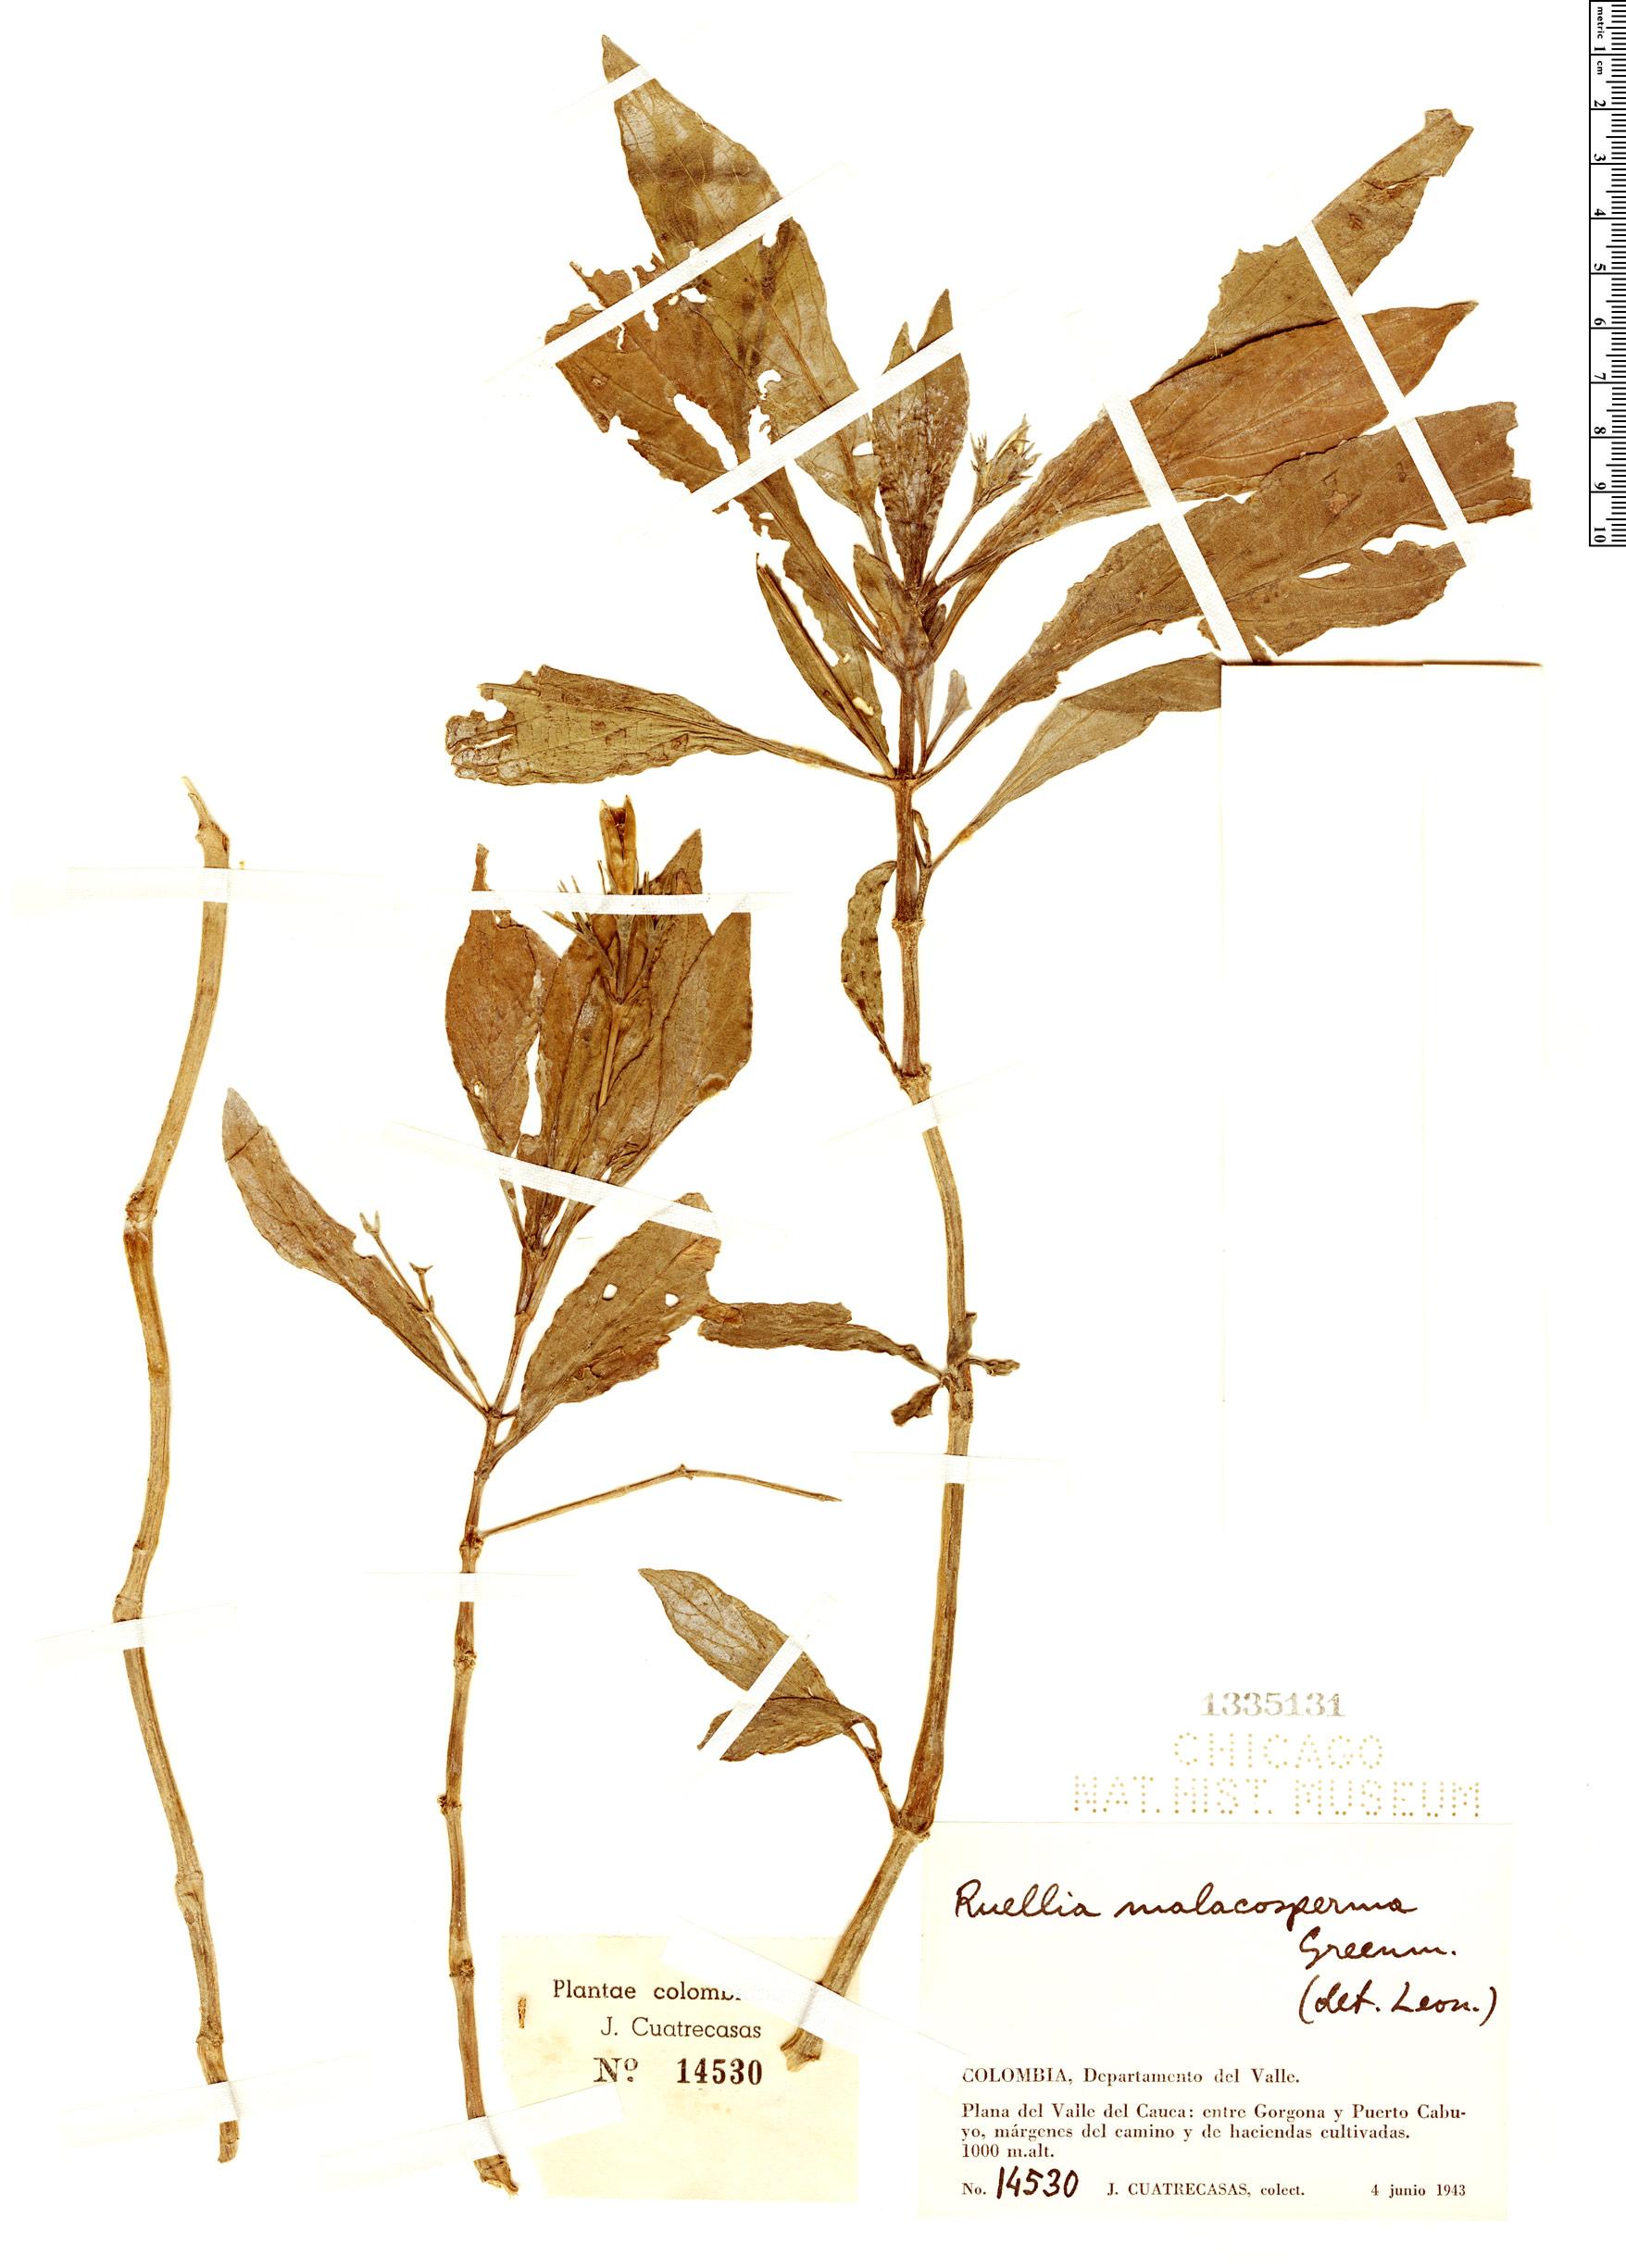 Specimen: Ruellia malacosperma